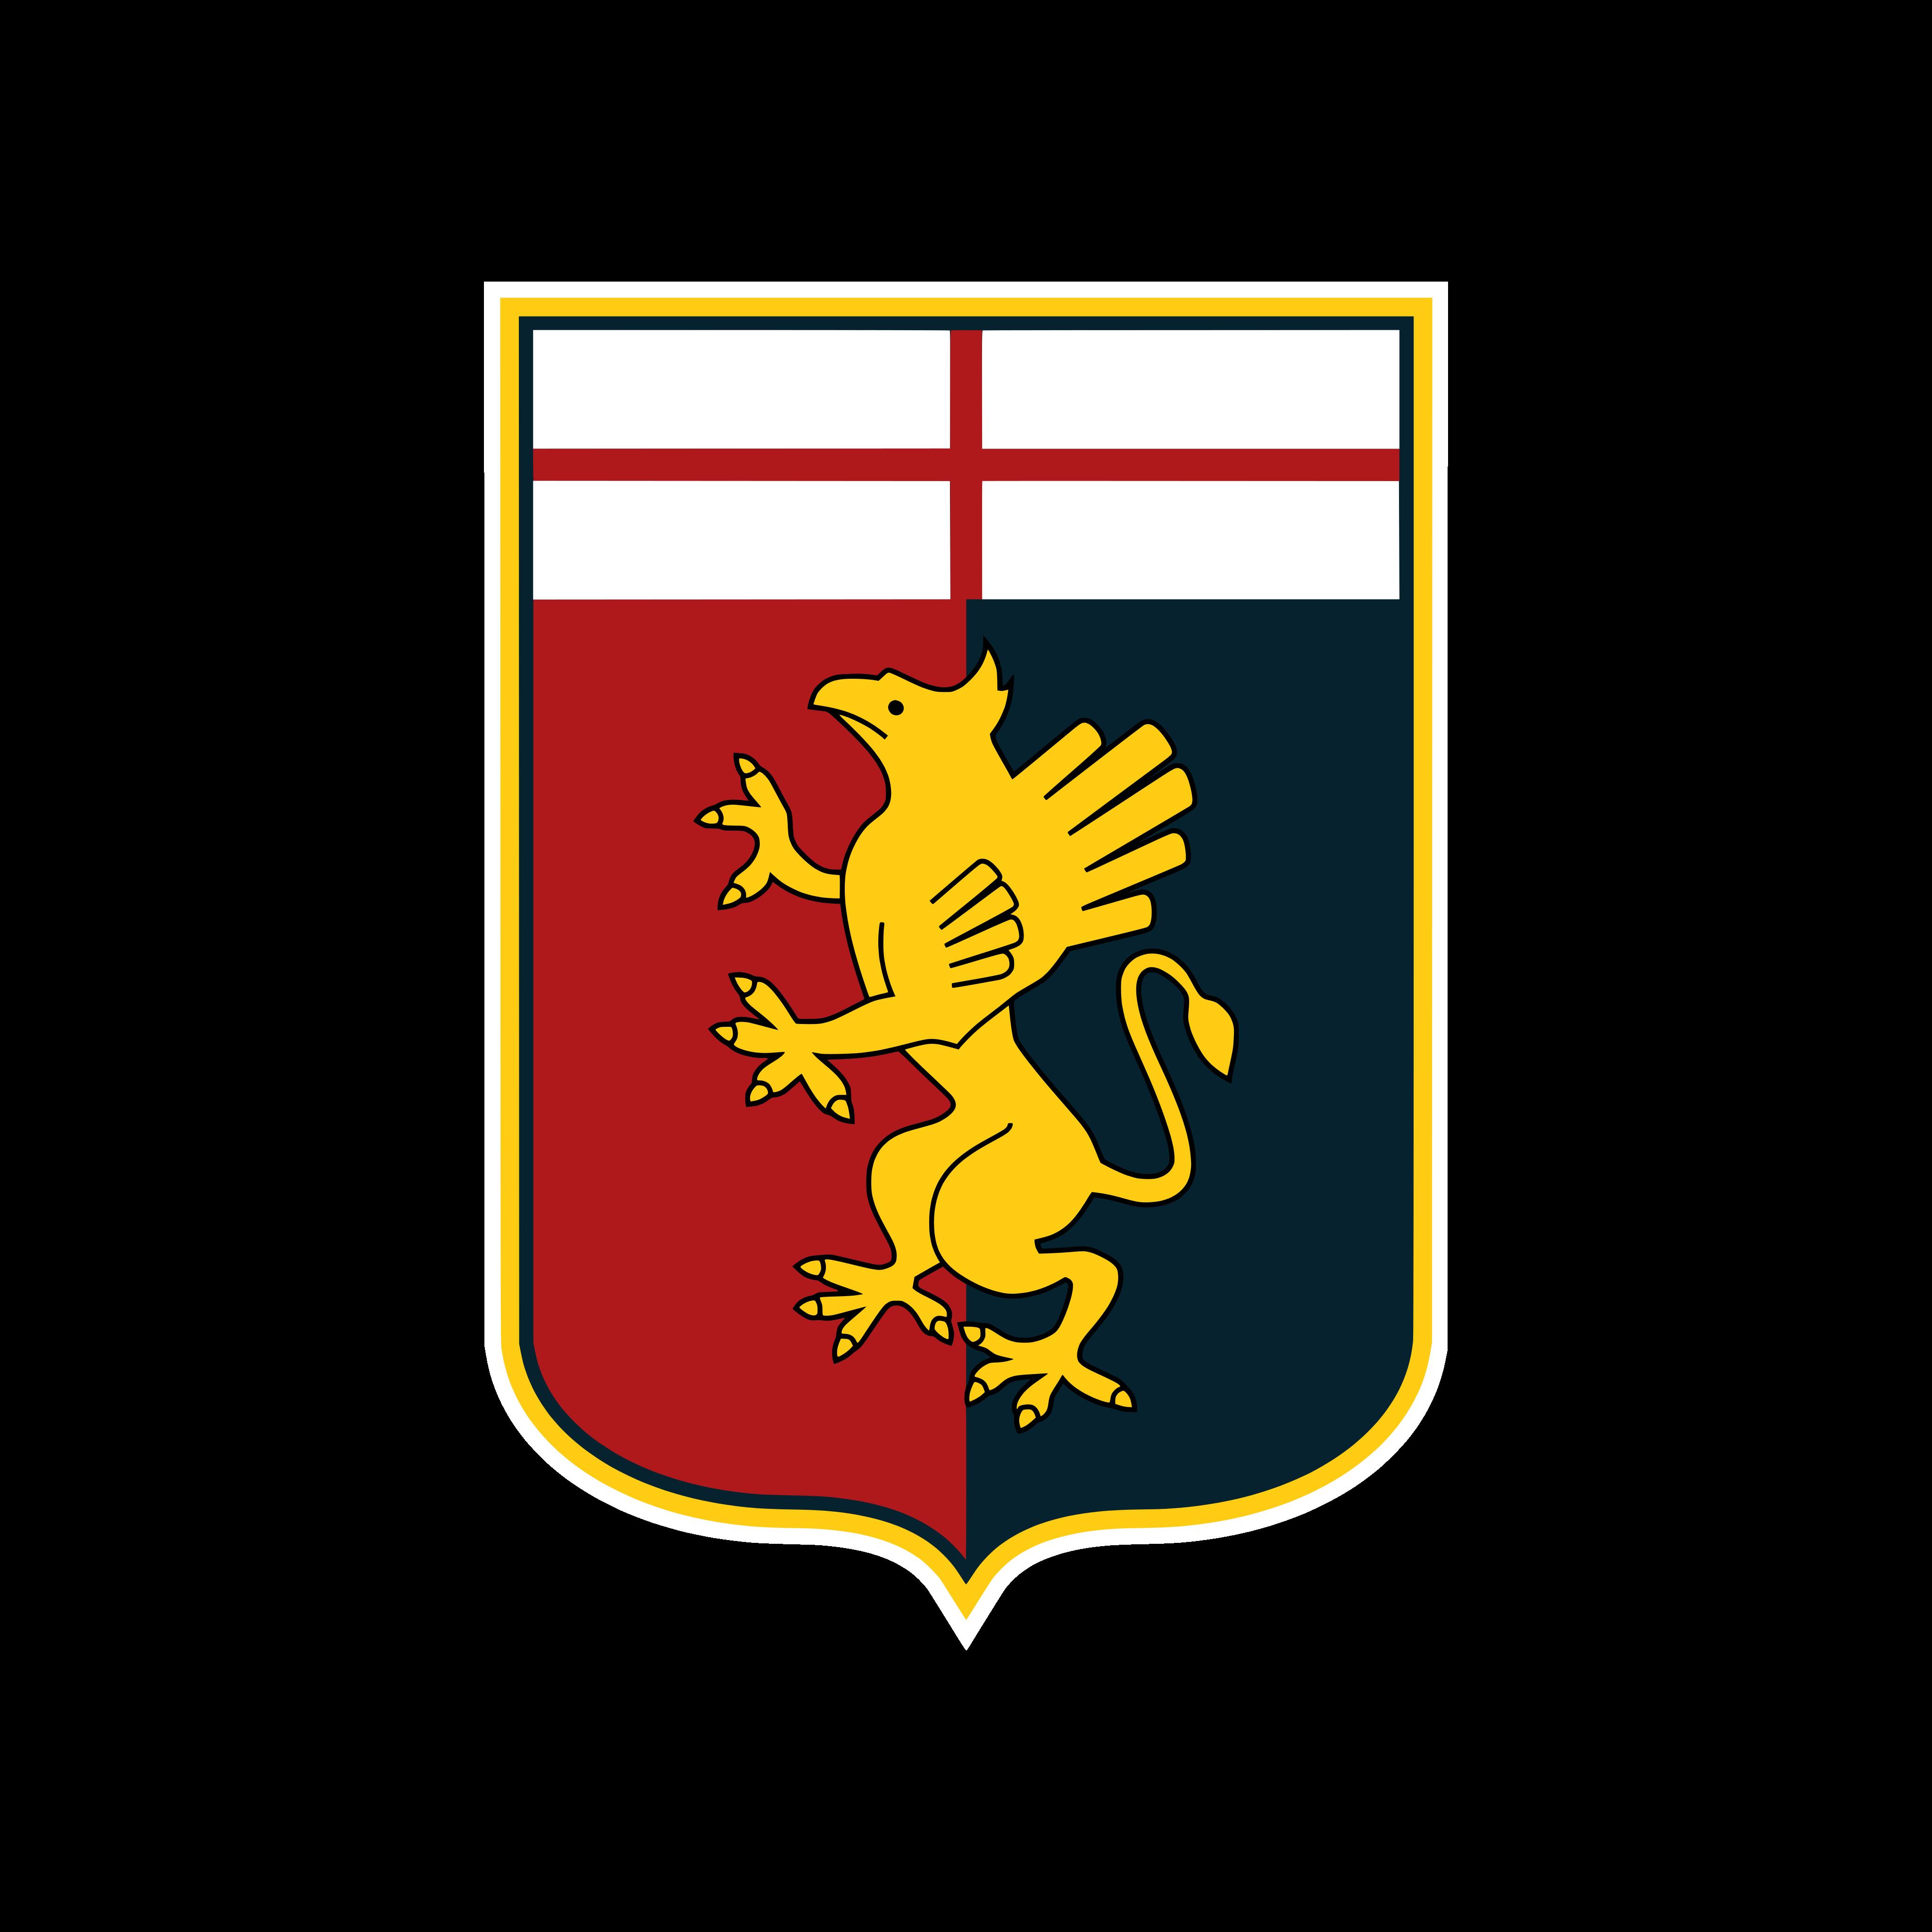 genoa fc logo 0 - Genoa FC Logo